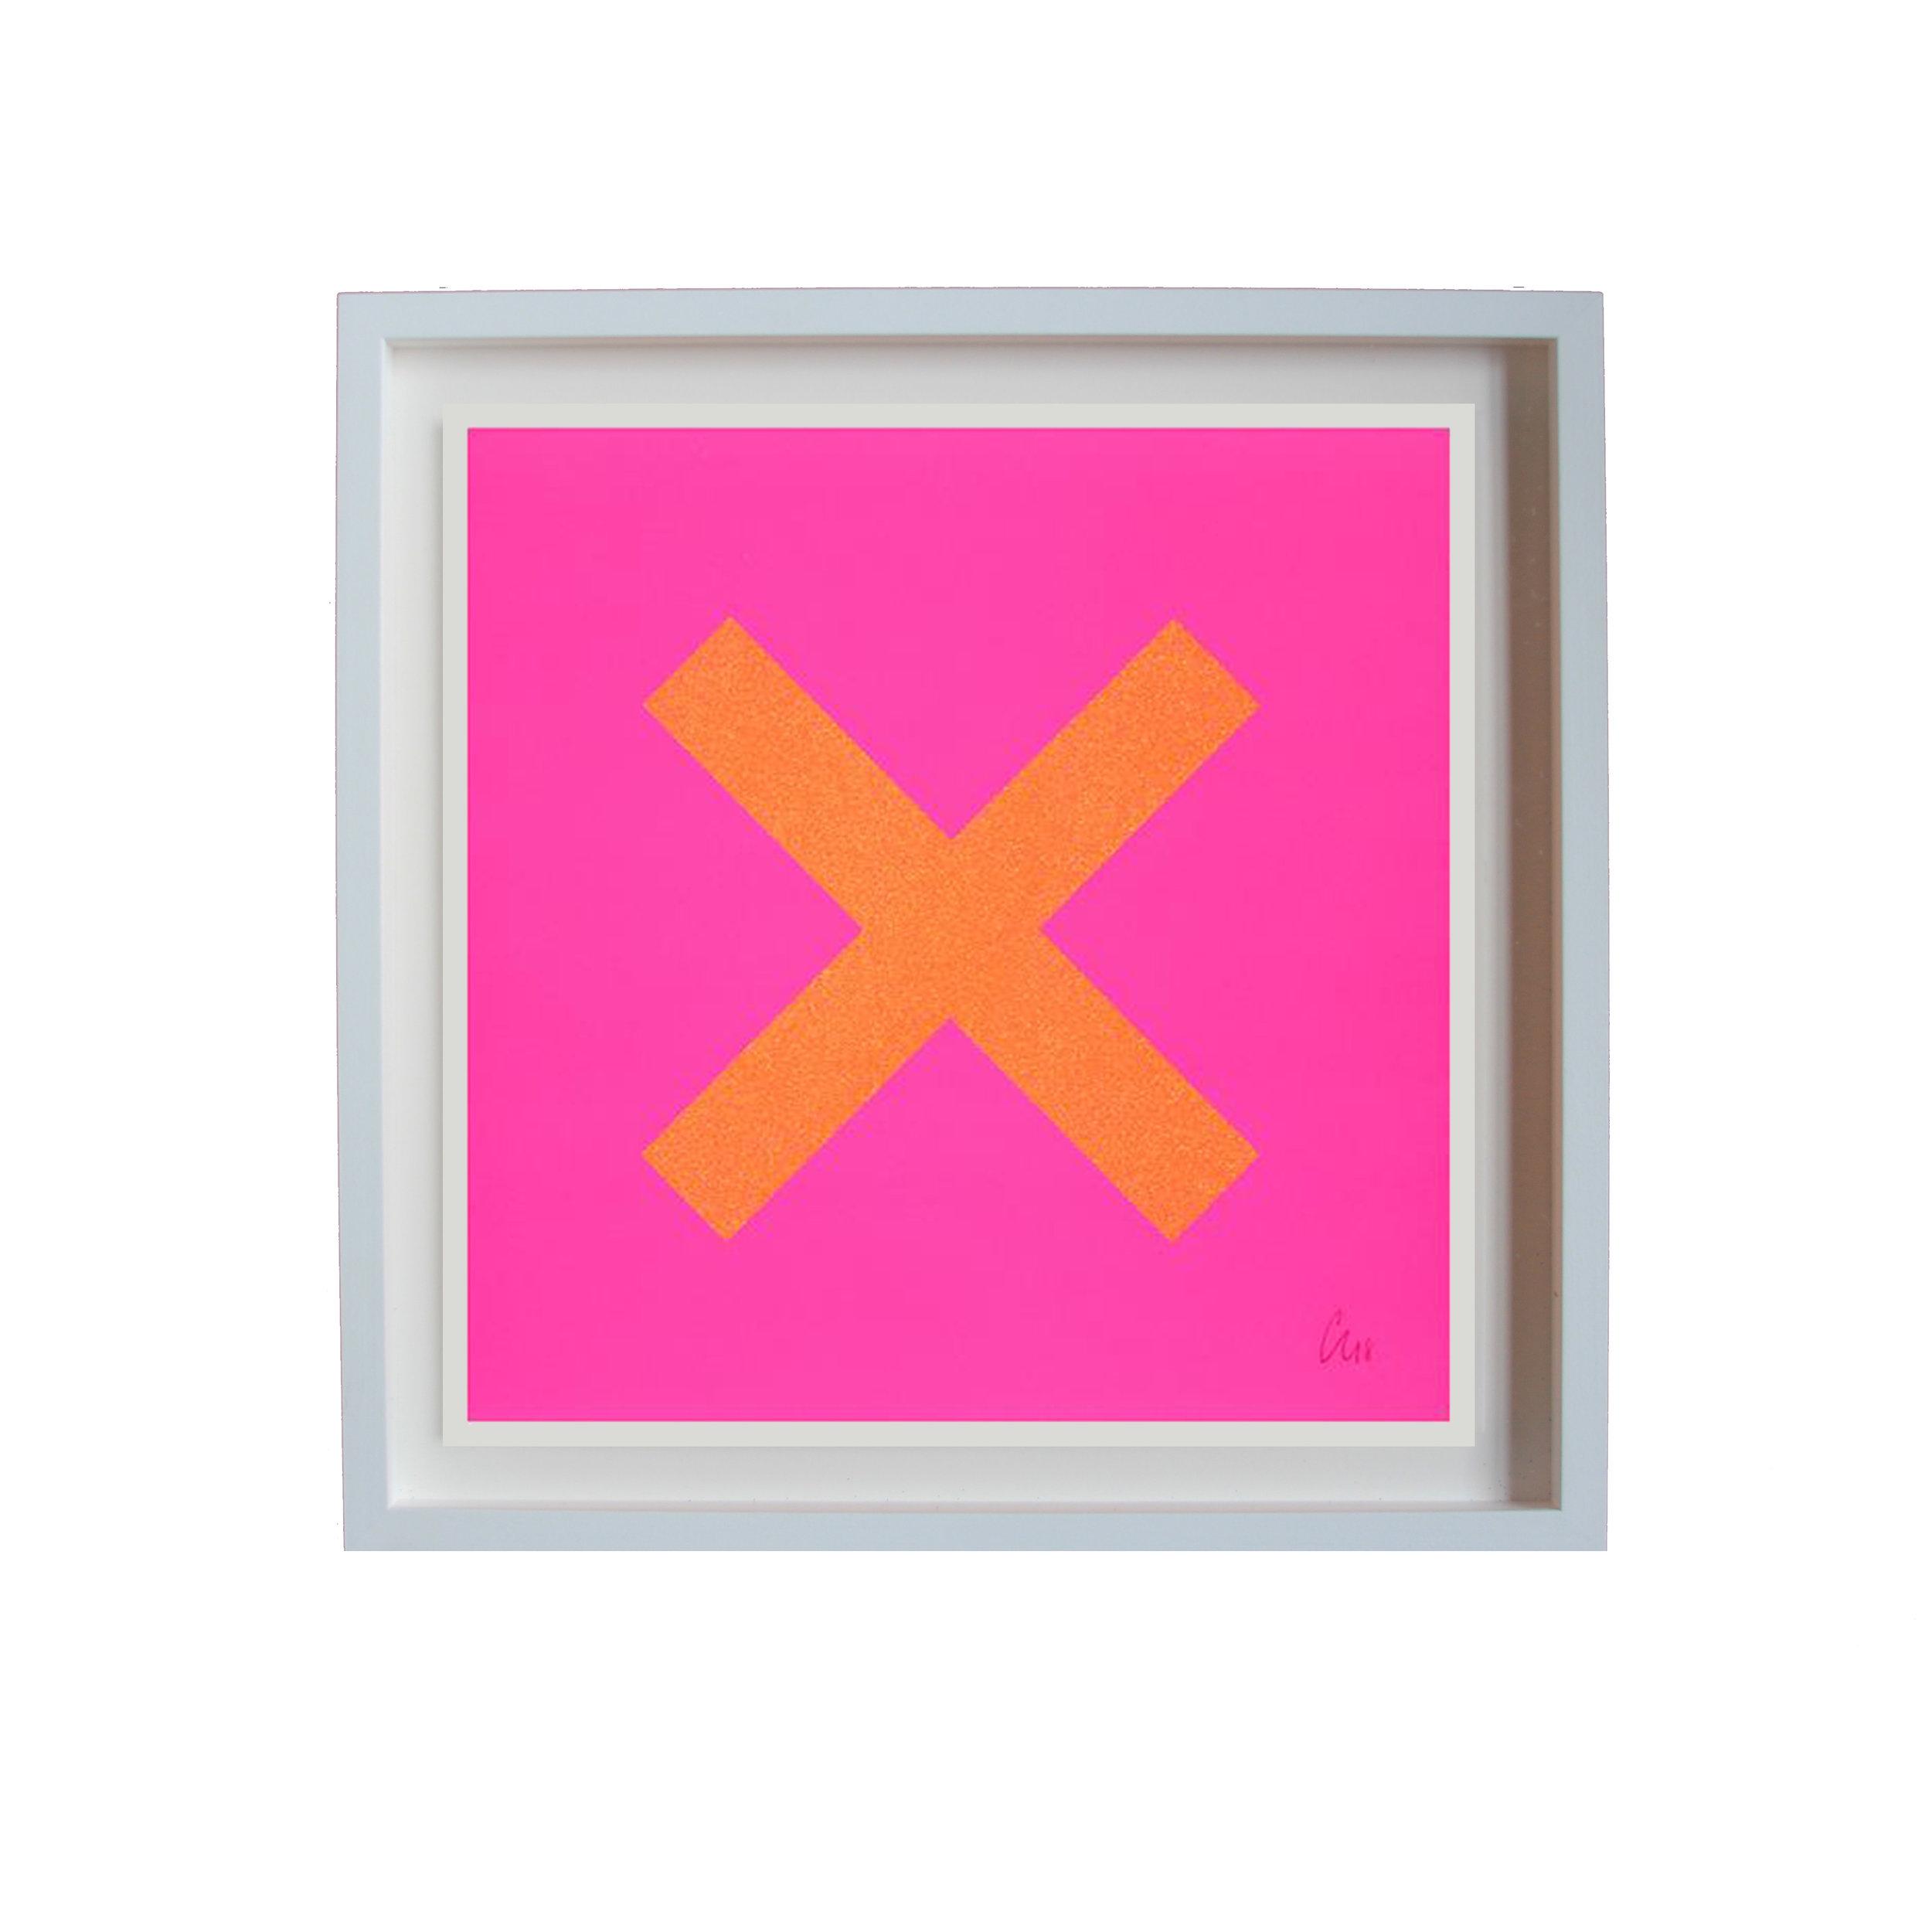 Chris Levine - X Marks the Spot (Pink & Orange)